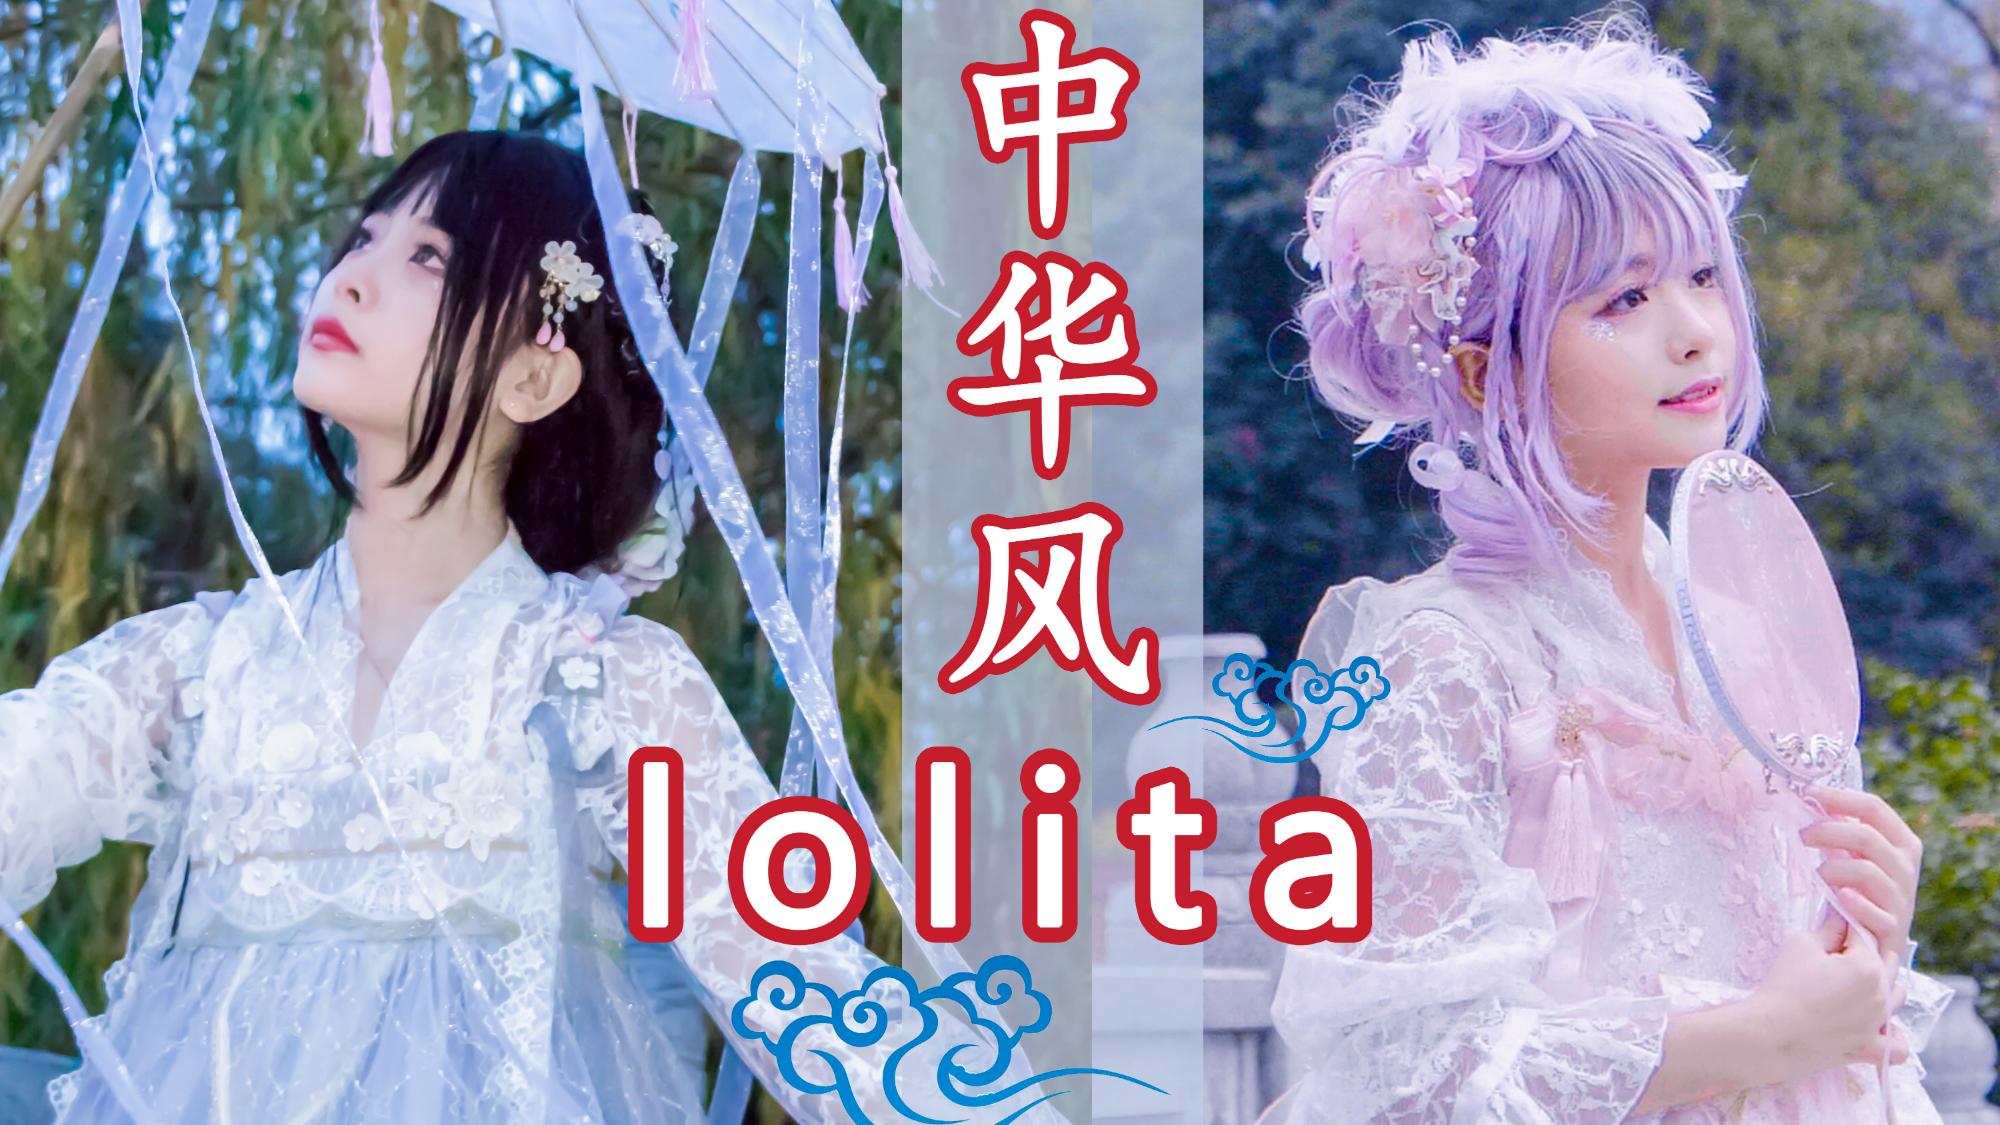 【Lolita】#LO裙蕉友#中华风lolita有多美?!国牌分享+妆面造型